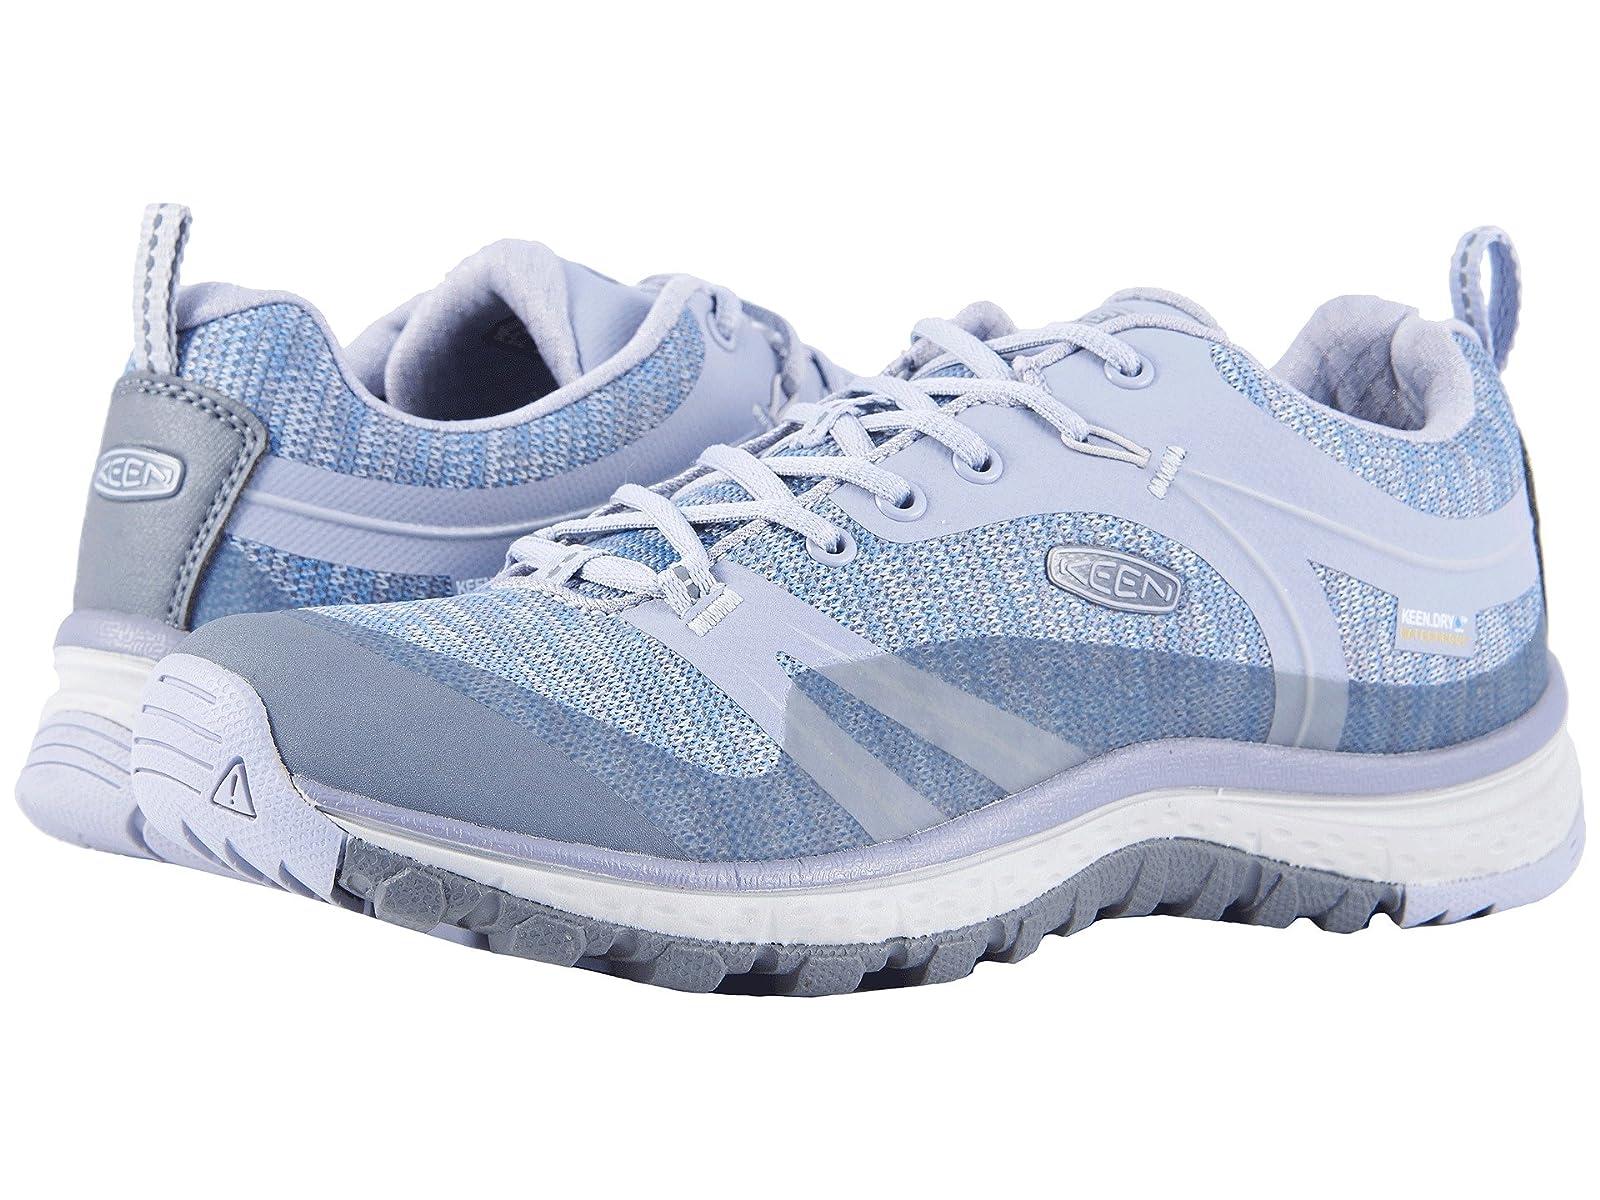 Keen Terradora WaterproofAtmospheric grades have affordable shoes